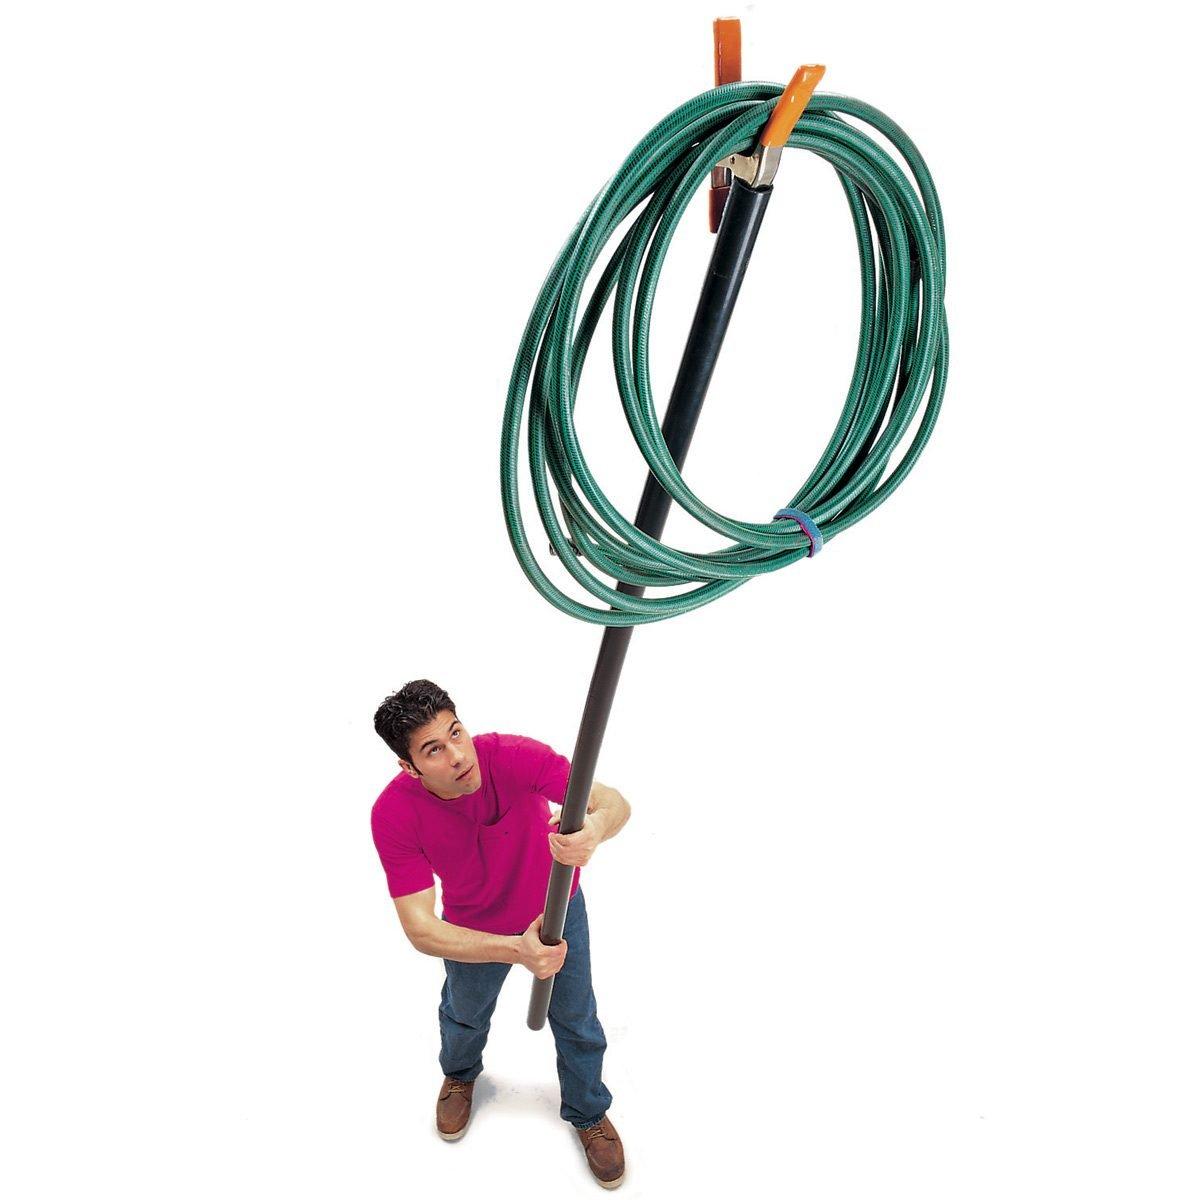 hang-it-high helper HH